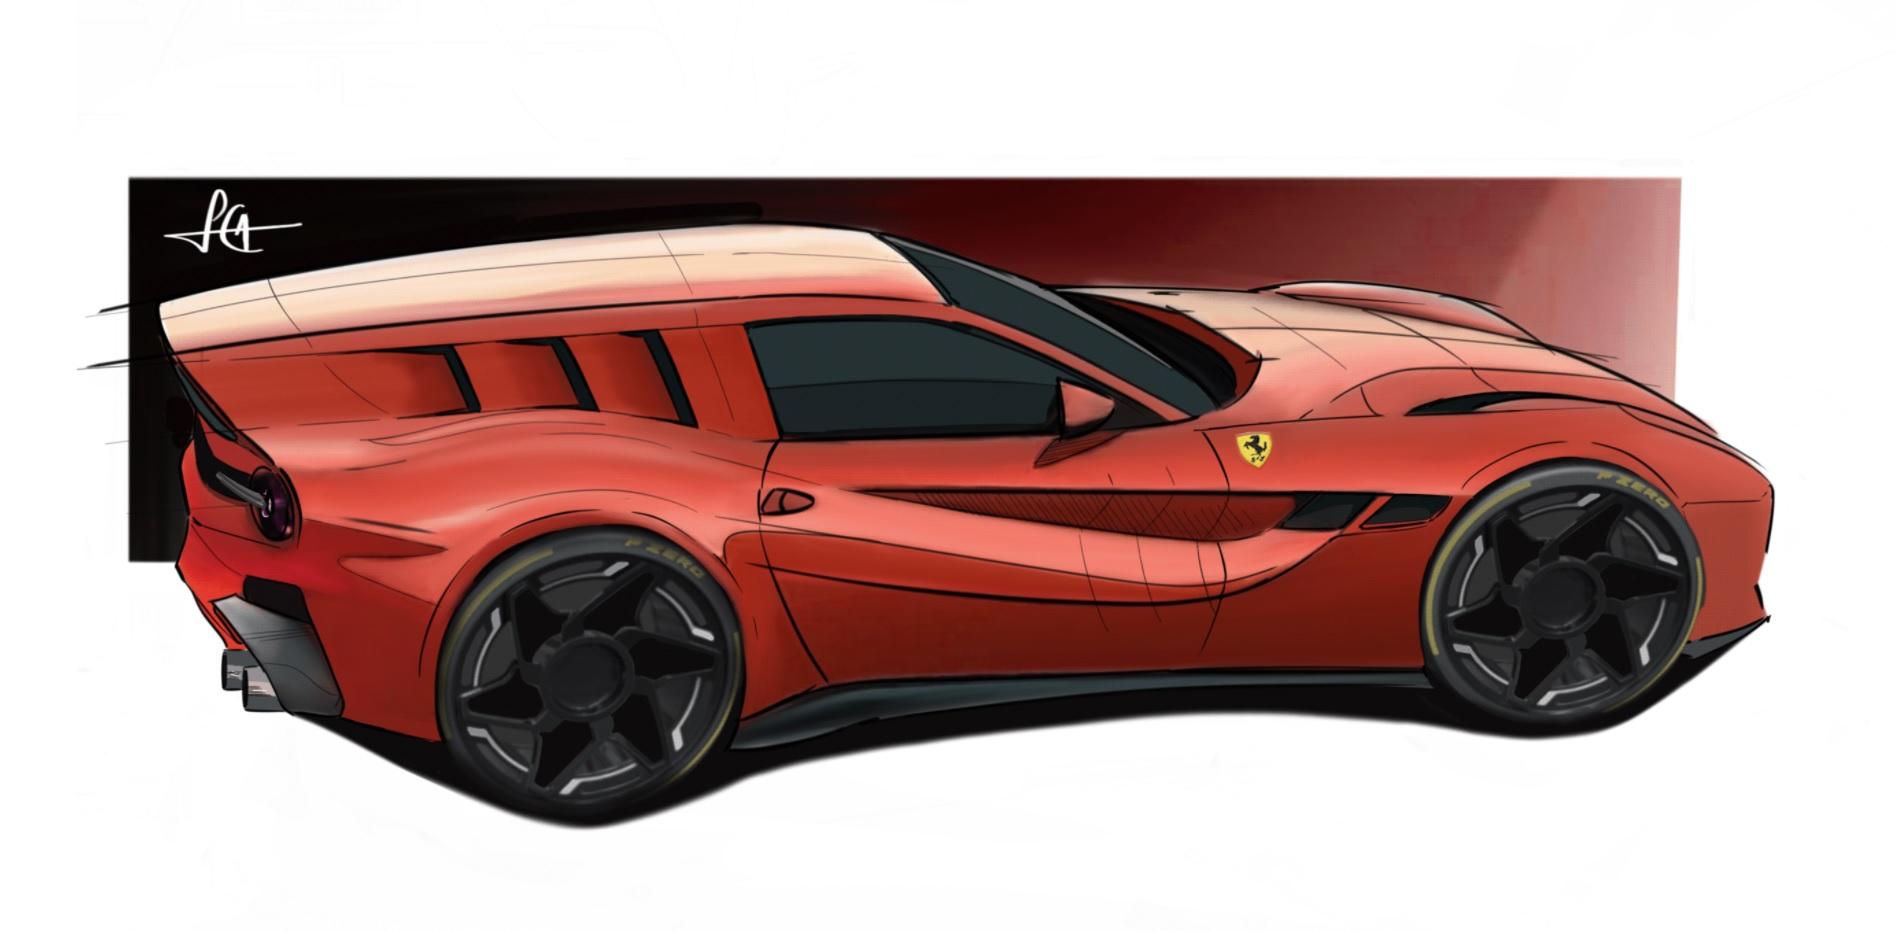 Modernized Ferrari Breadvan Imagined With F12 Underpinnings Autoevolution